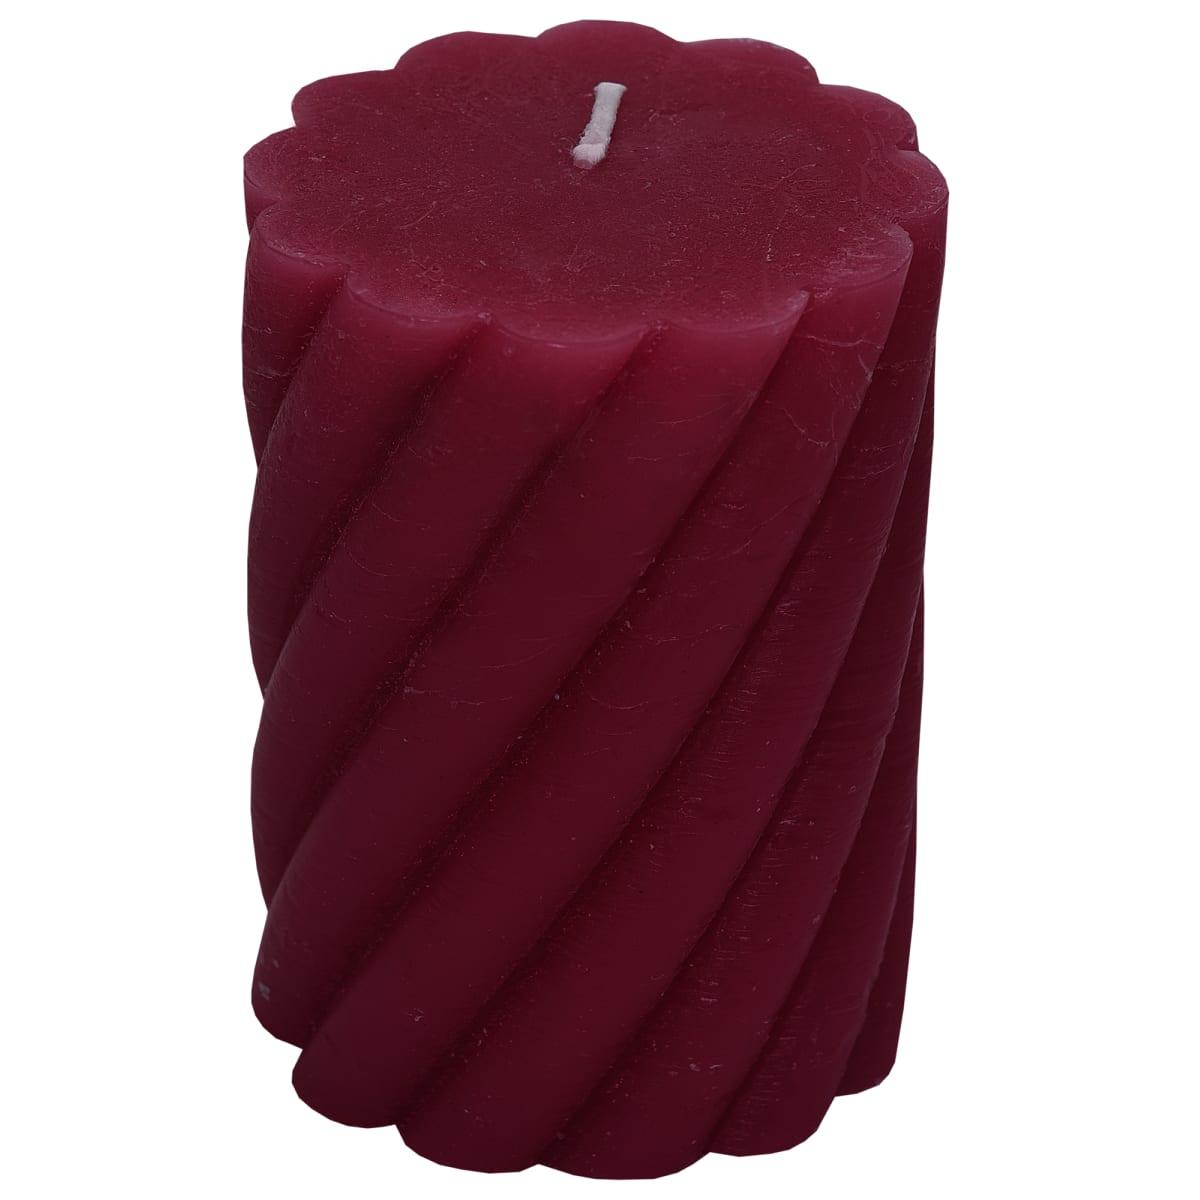 Свеча-столбик витой «Рустик» 7.4х8 см цвет бордо